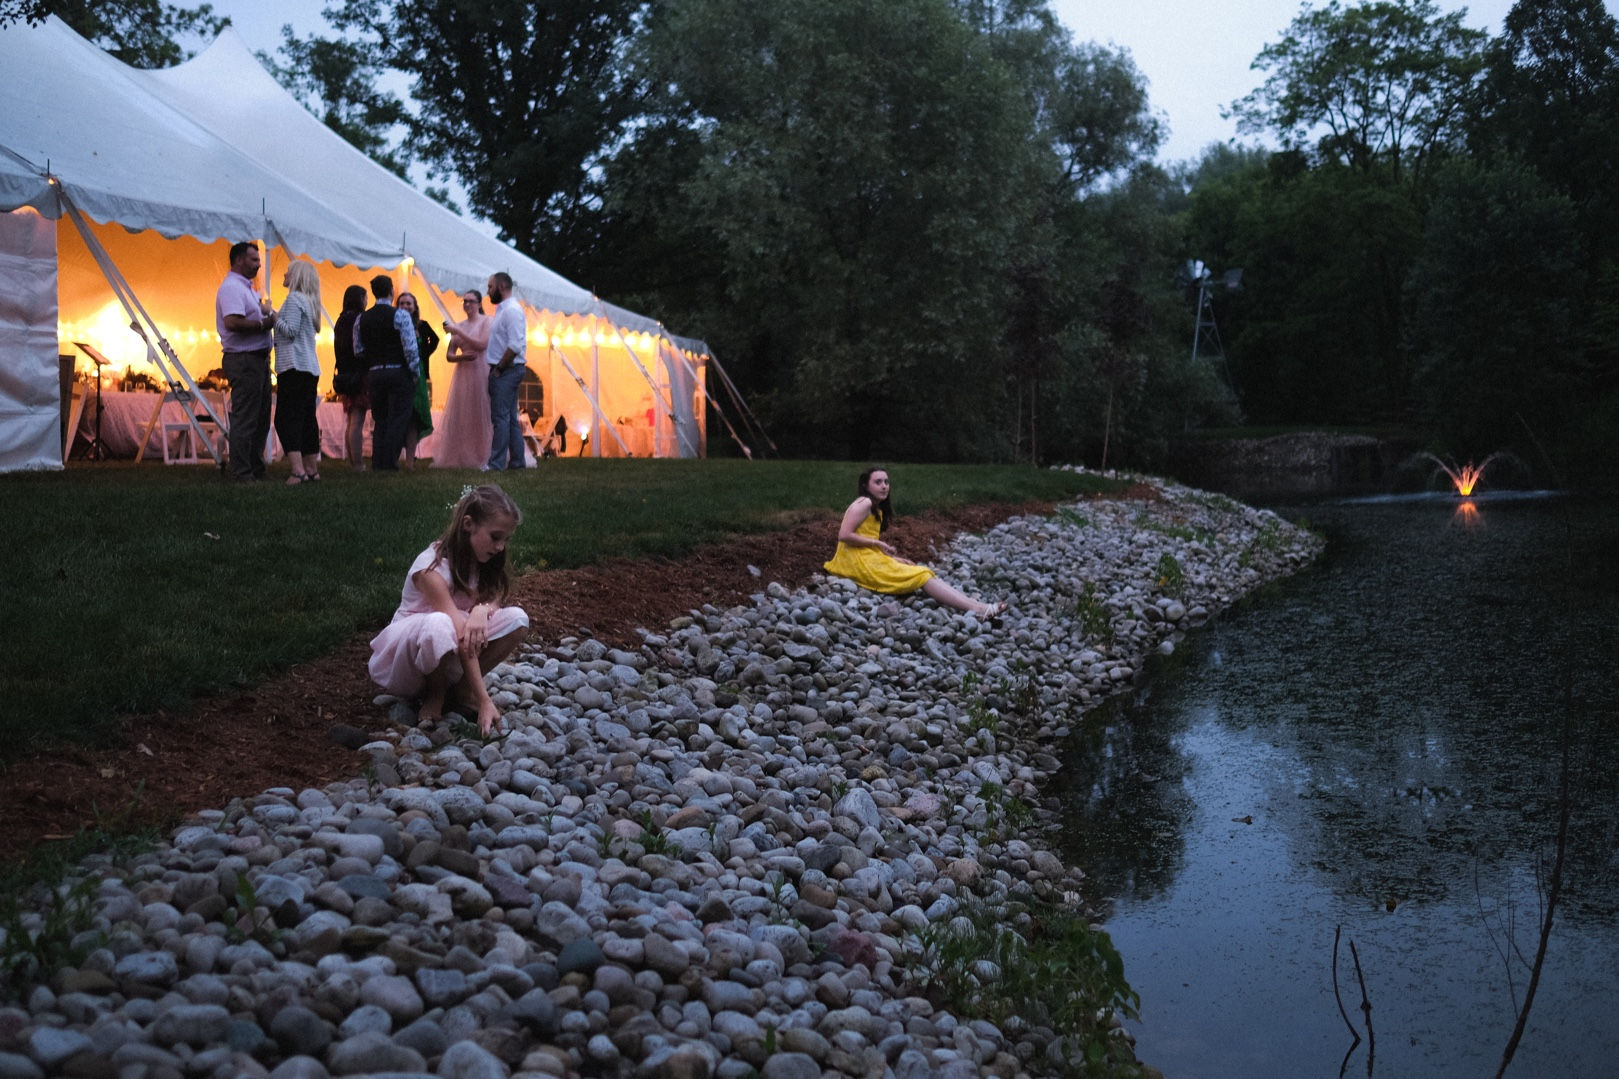 11_CARLEY STRATFORD-612_Events_Weddings_2018_Travel_Engagement_Photography_best_Portraits.jpg